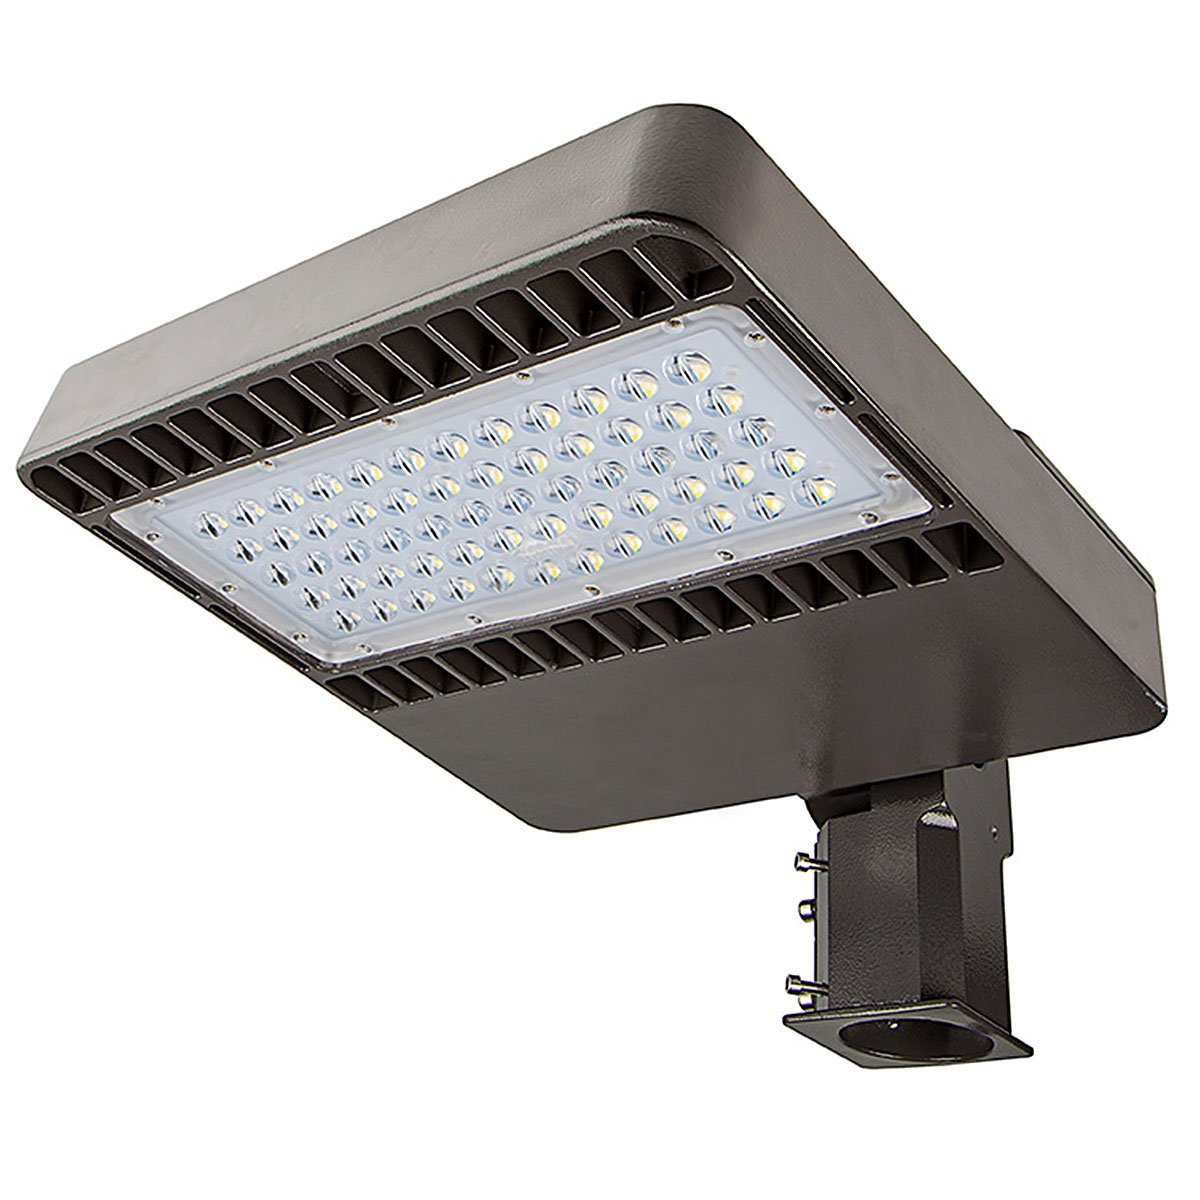 Phenas 48W LED Street Light, Road Lamp, LED Parking Lot Lights Pole LED Outdoor Site and Area Light, Shoe Box Light, 11000L, 4800-5300k, ROHS ETL DLC CE (48 Watts), 5 Years Warranty